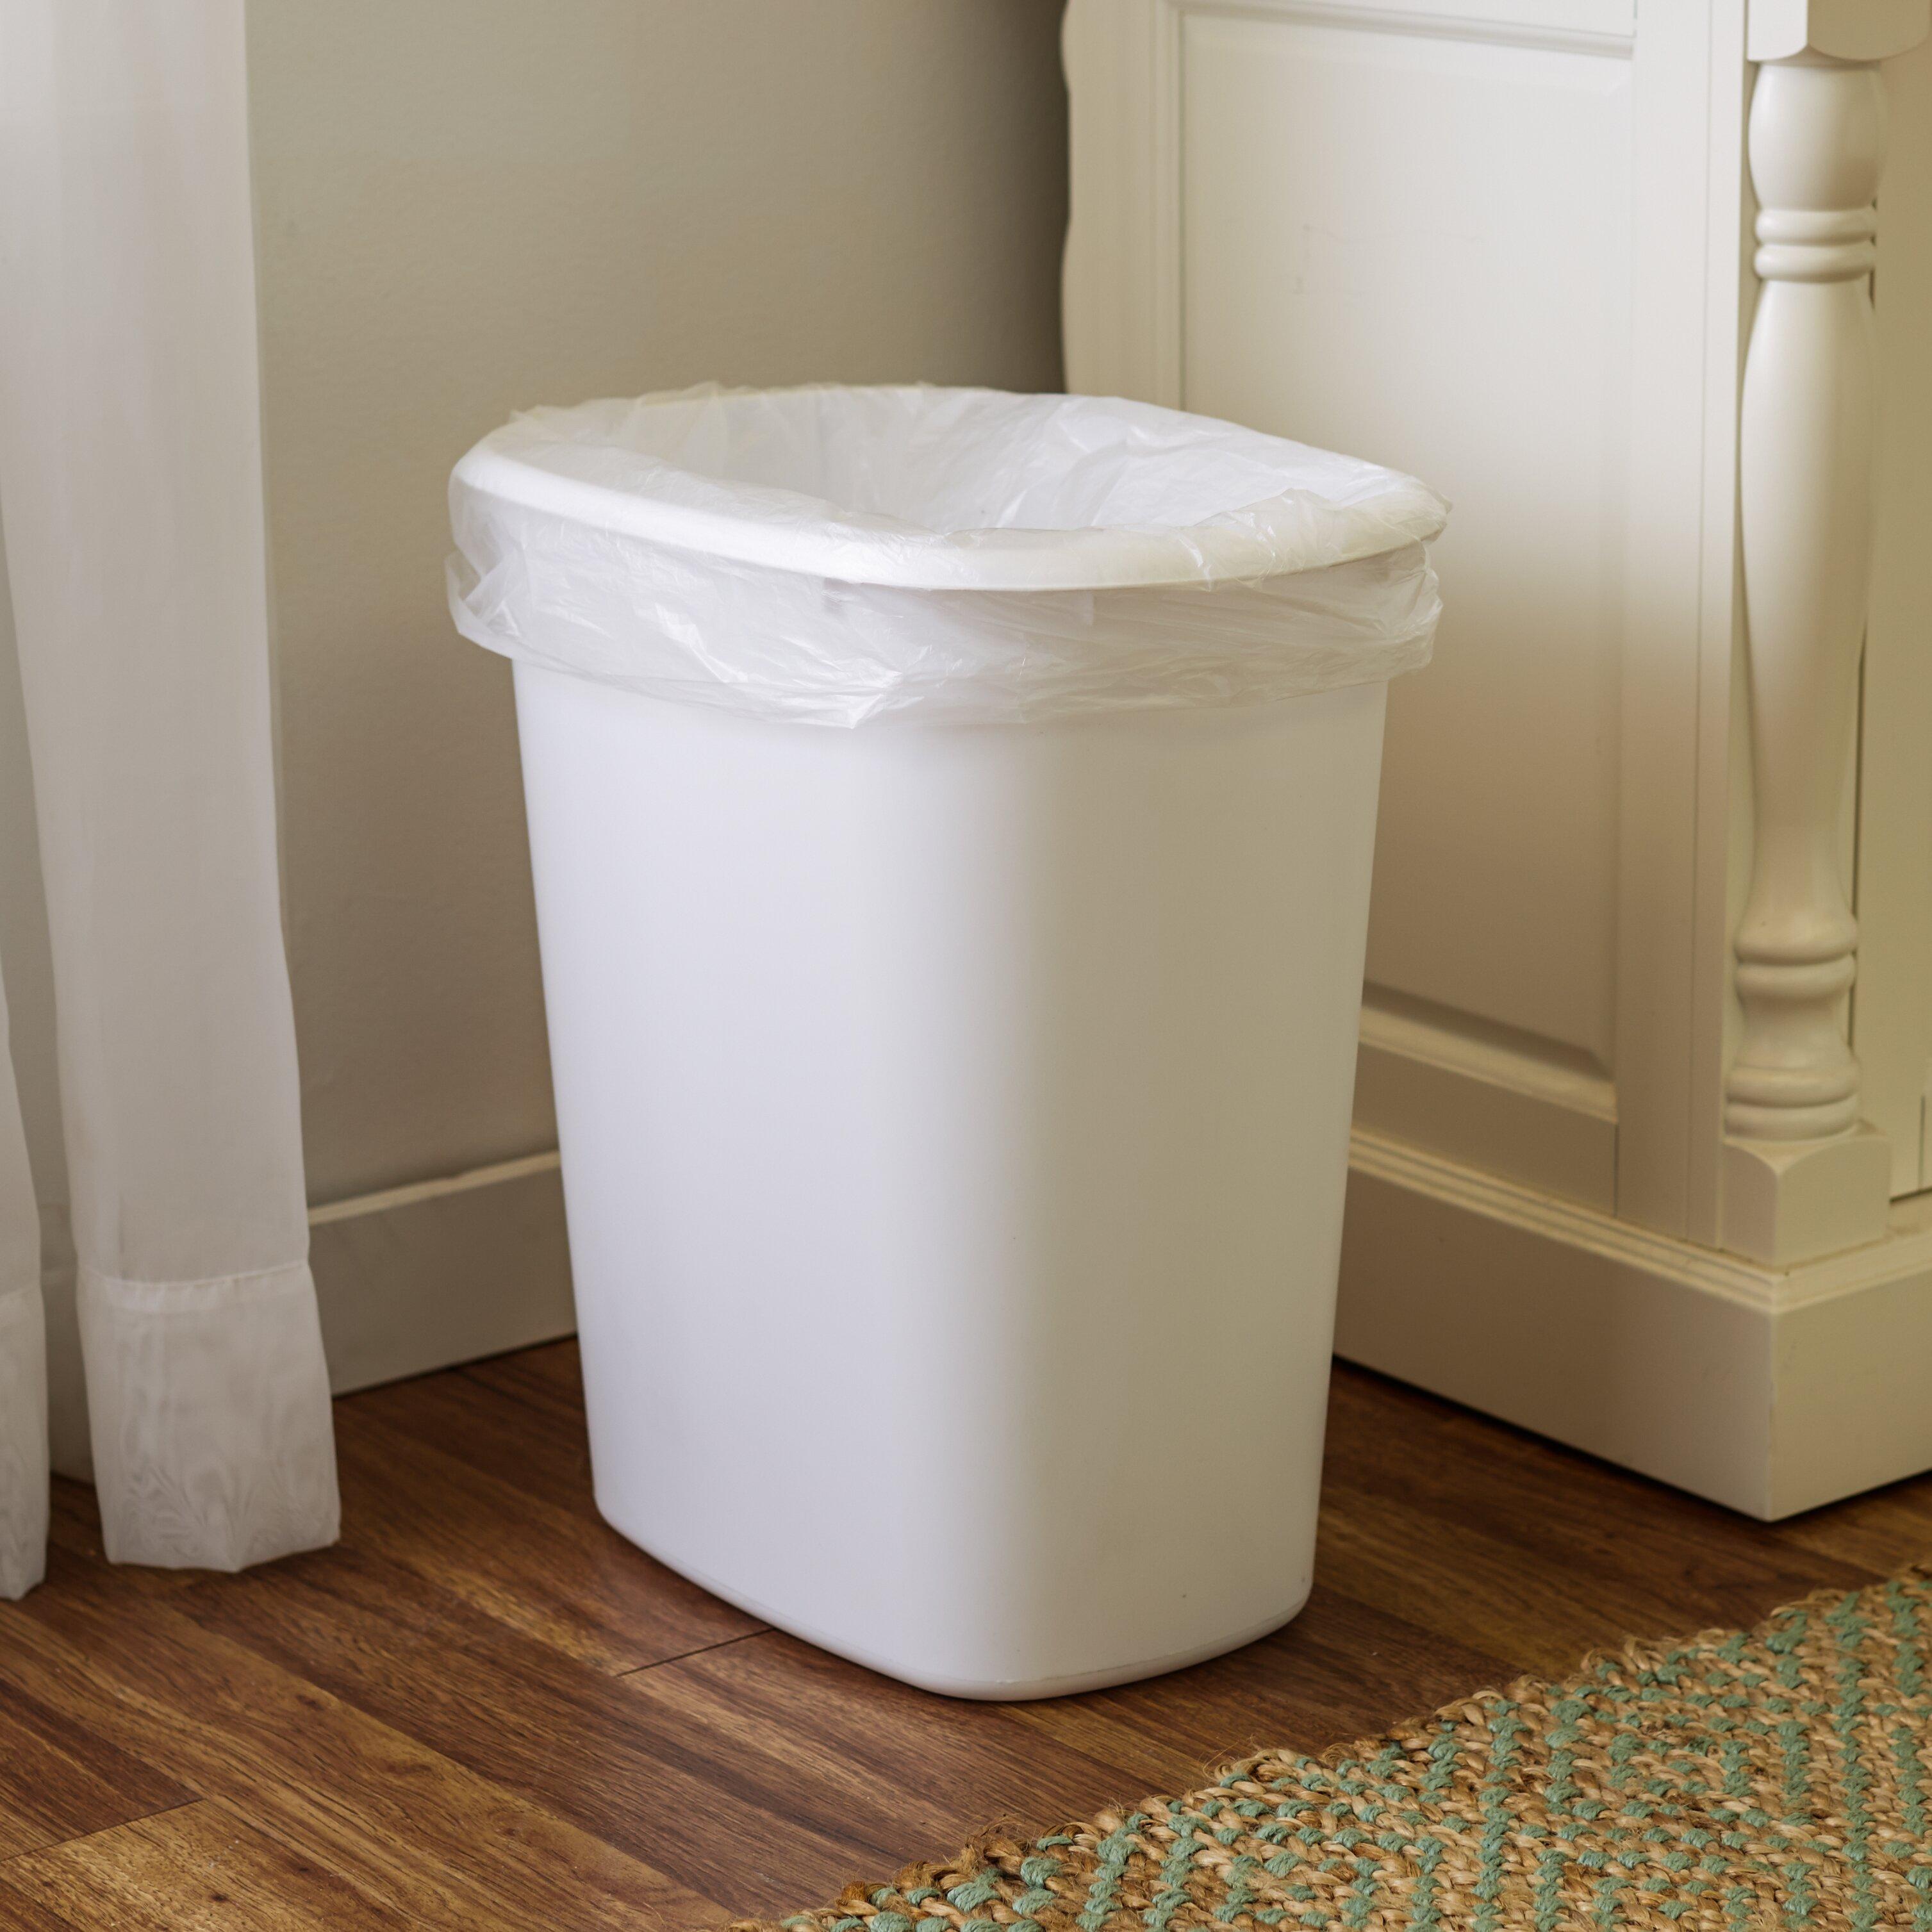 wayfair basics wayfair basics 10 gal trash can reviews wayfair. Black Bedroom Furniture Sets. Home Design Ideas